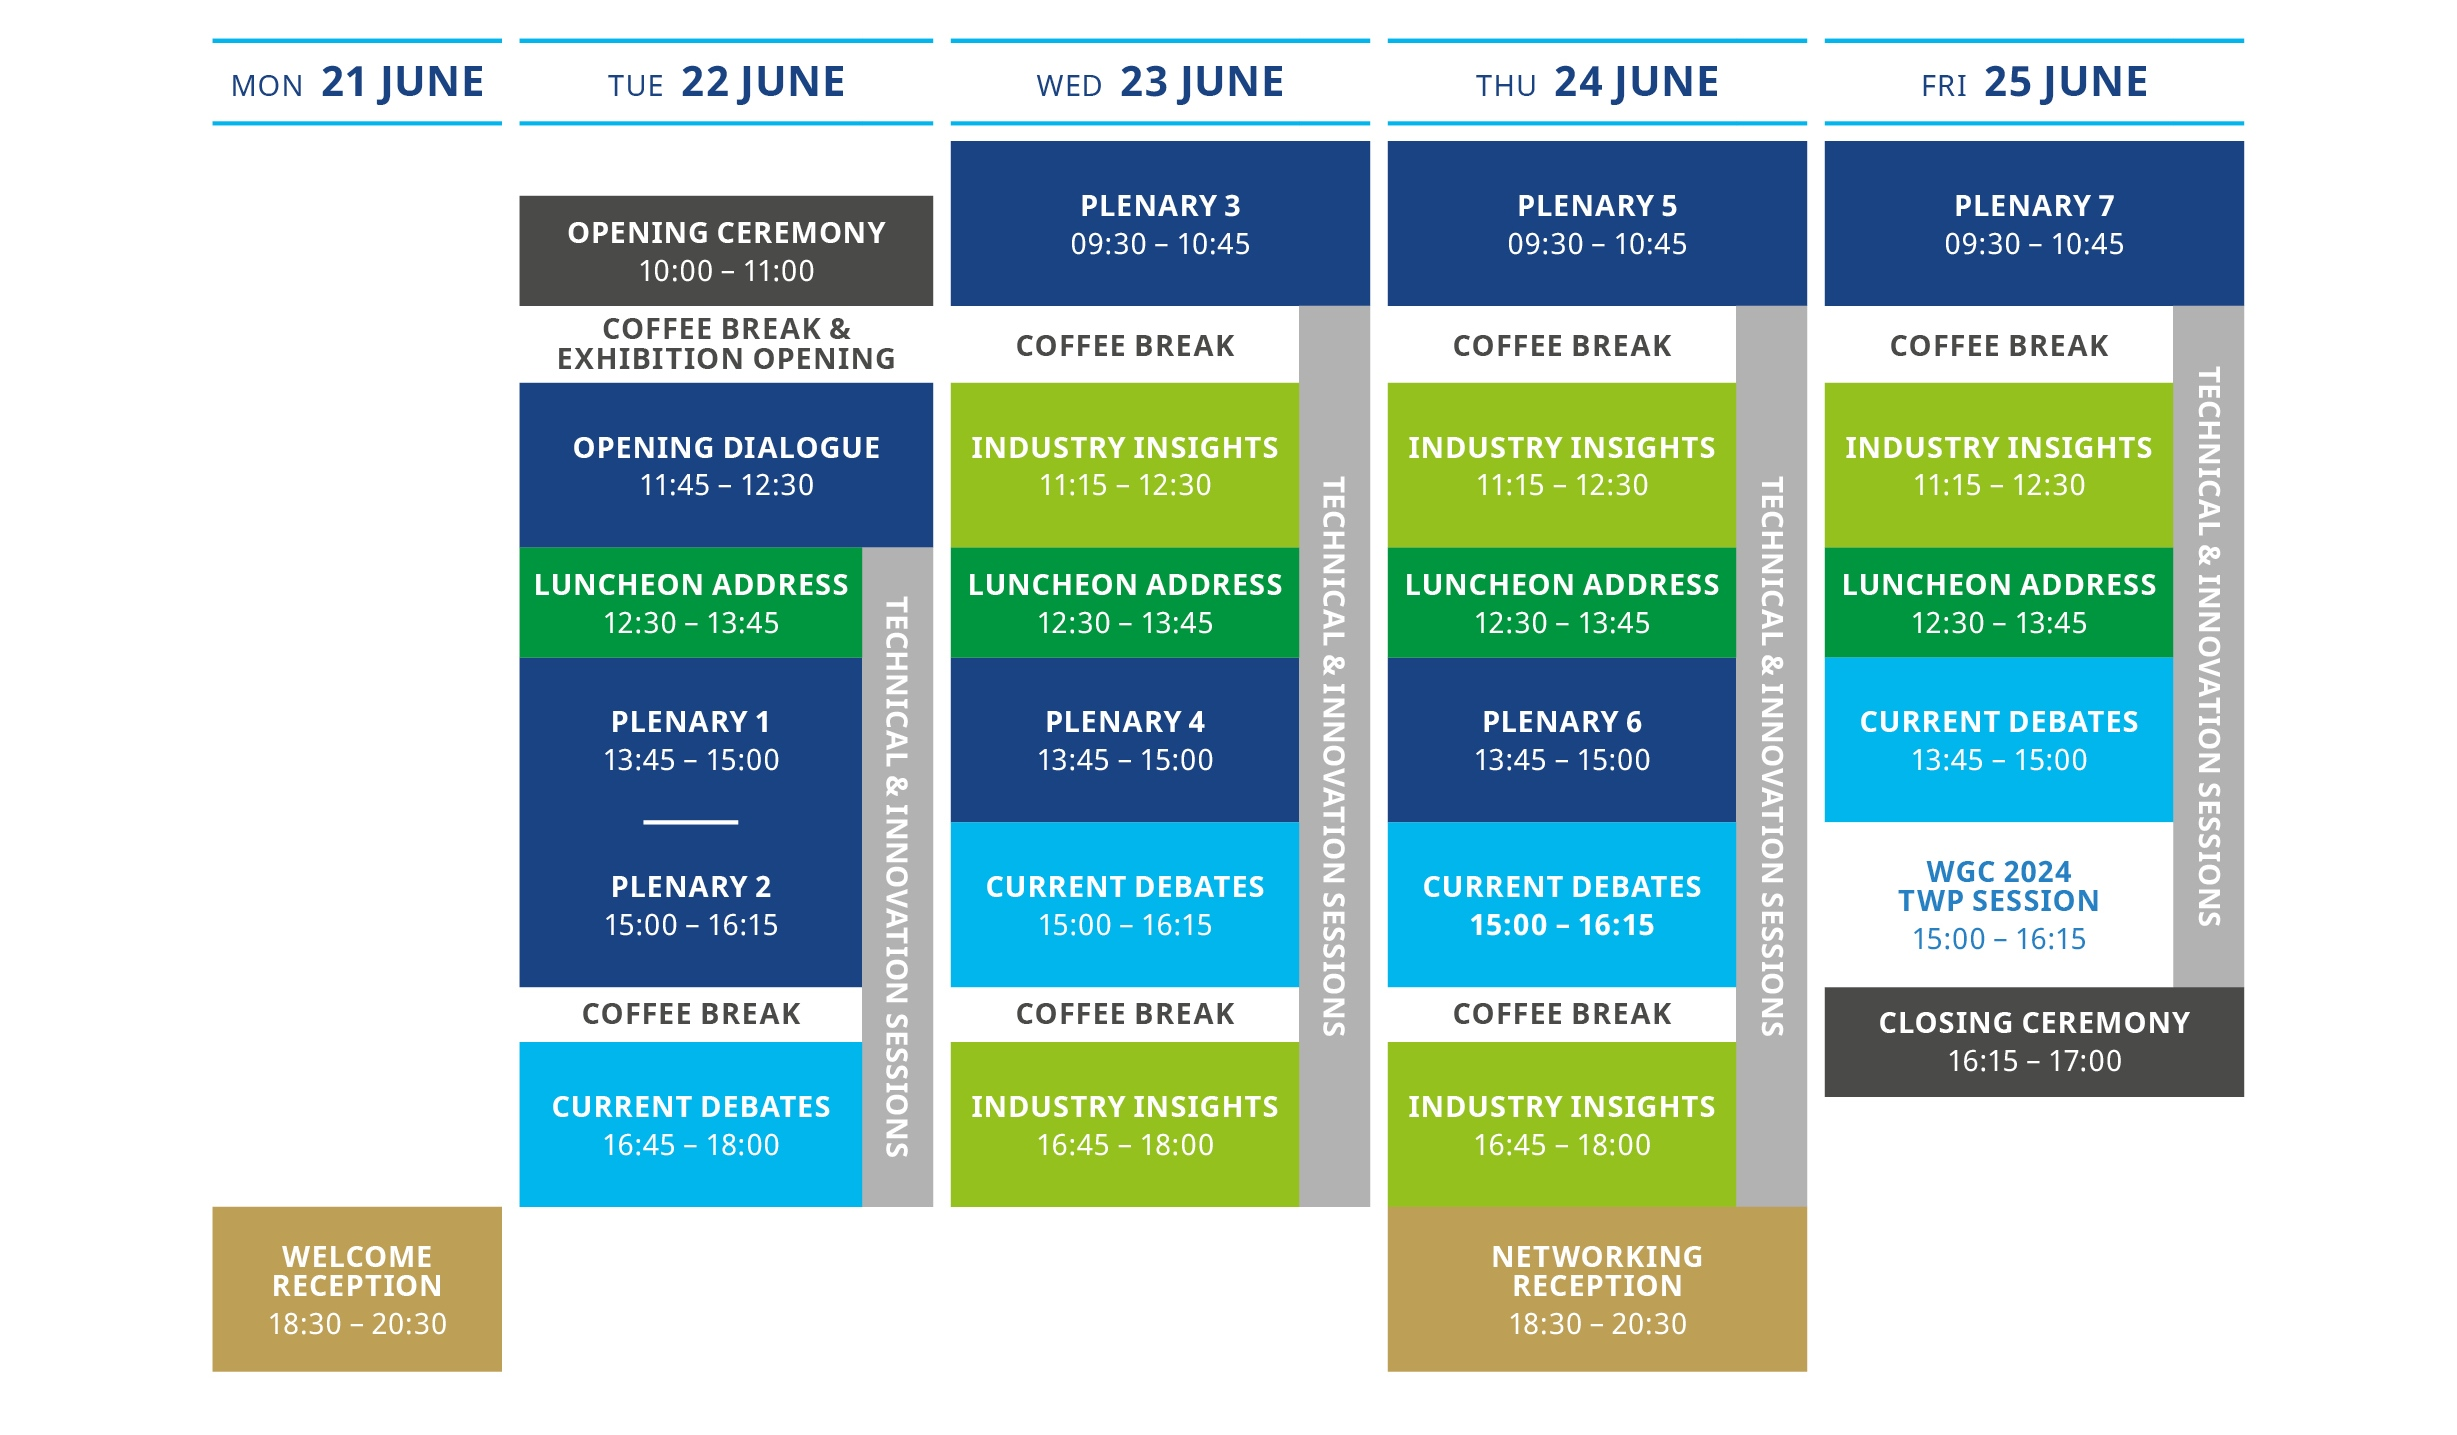 WGC 2021 Program Overview